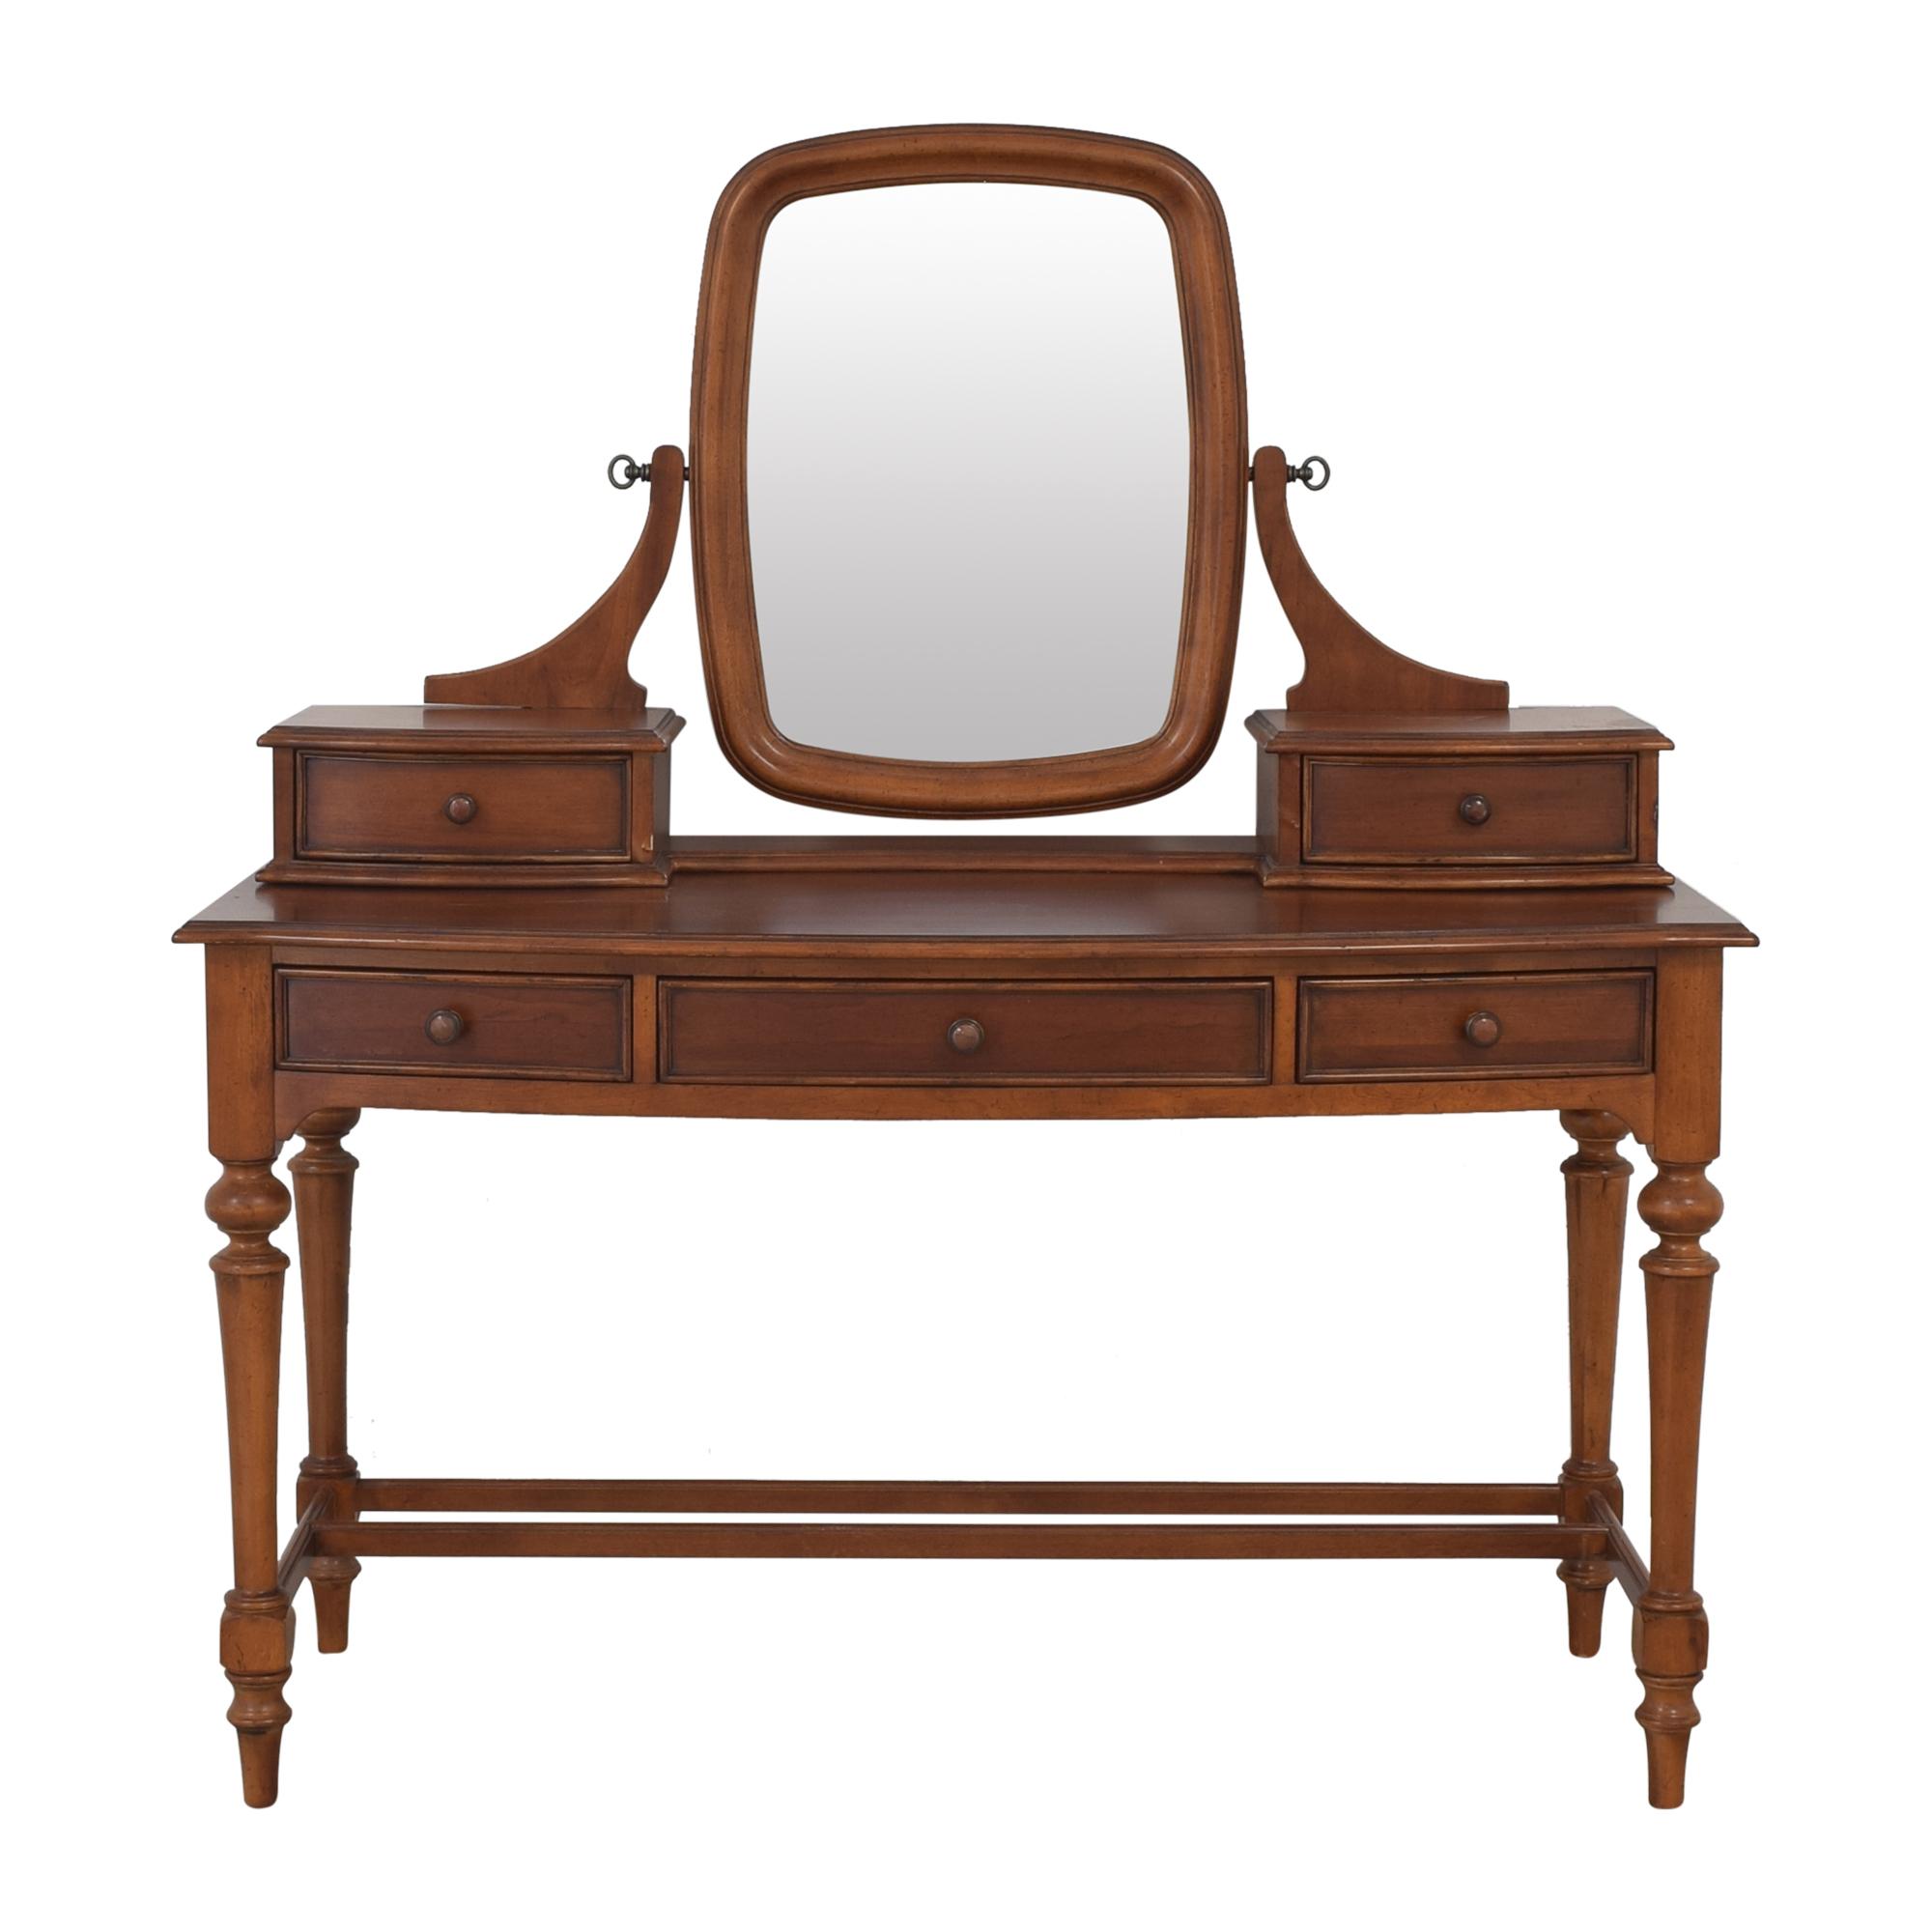 Thomasville Thomasville Felicity Vanity Desk with Mirror second hand